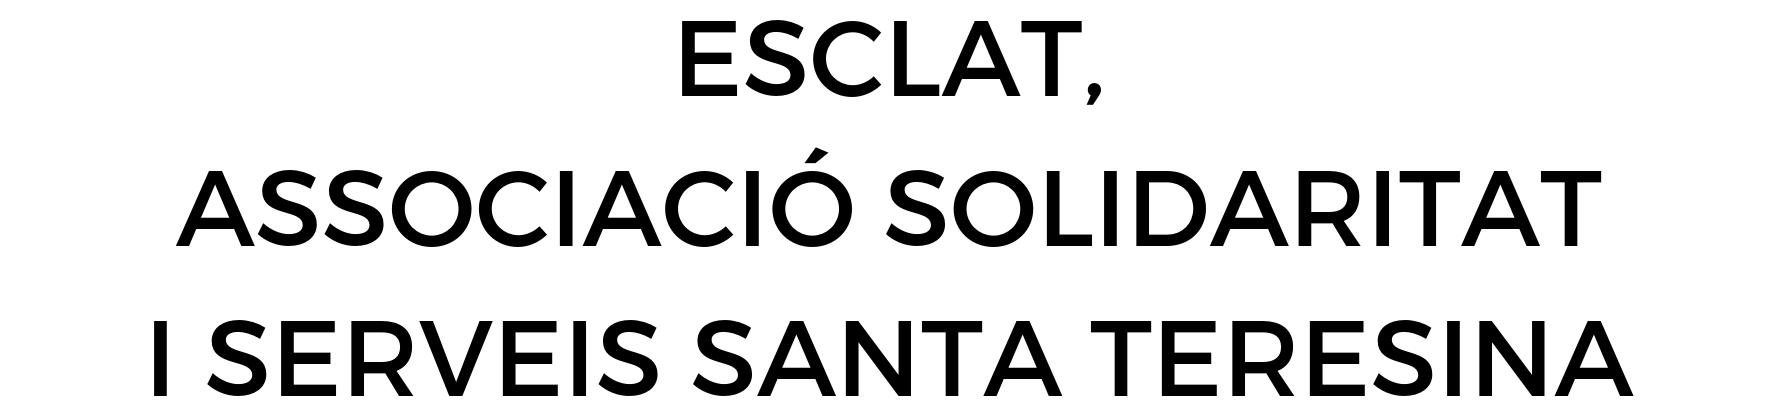 public://Banners/esclat_0.png